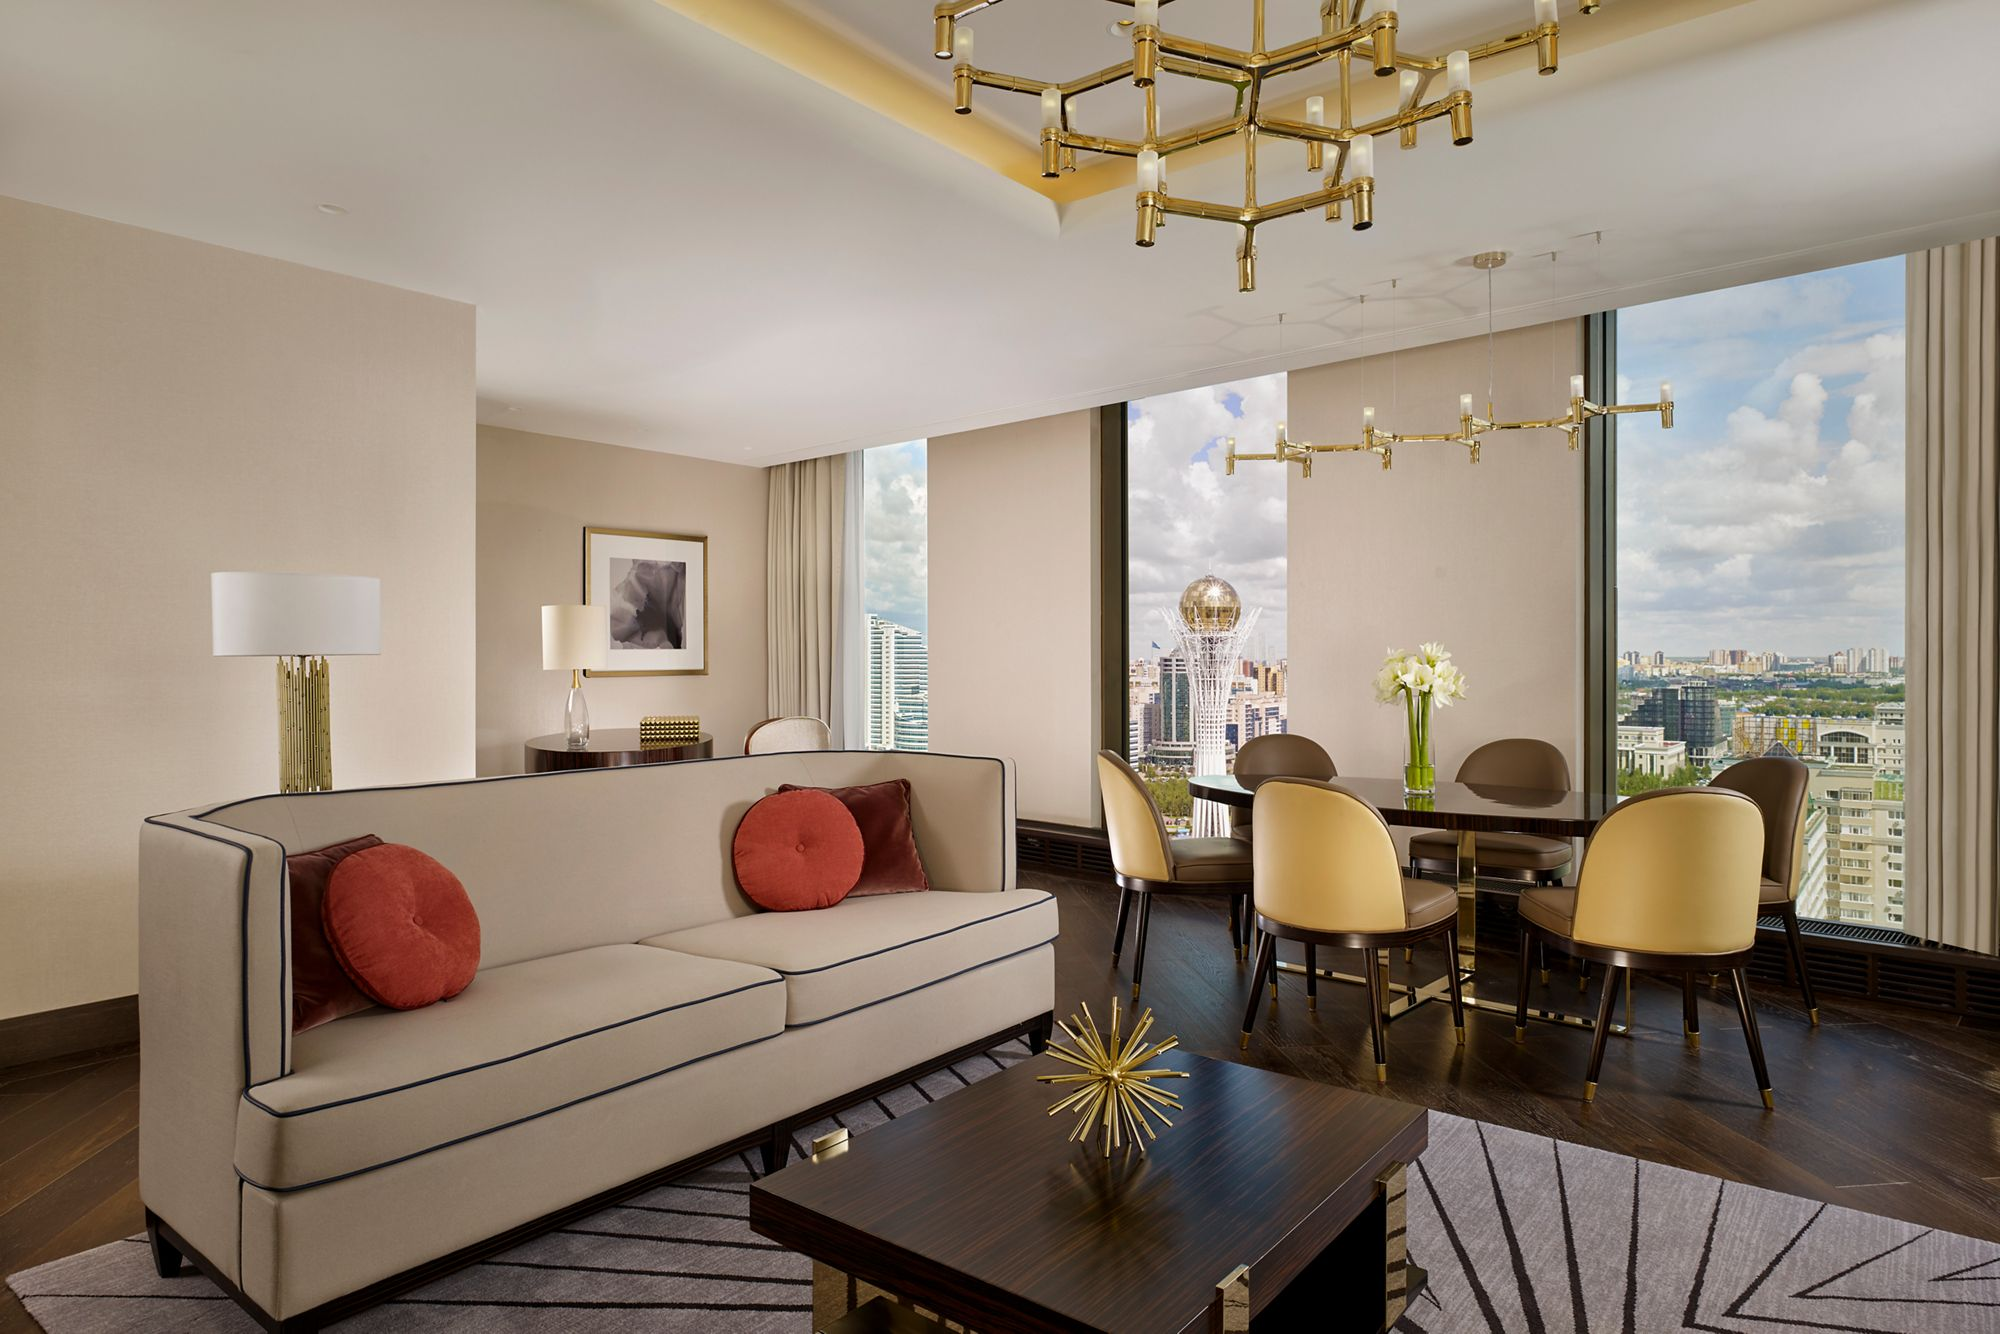 The Ritz-Carlton Astana қонақүйіндегі өкілдік люкс бөлме.